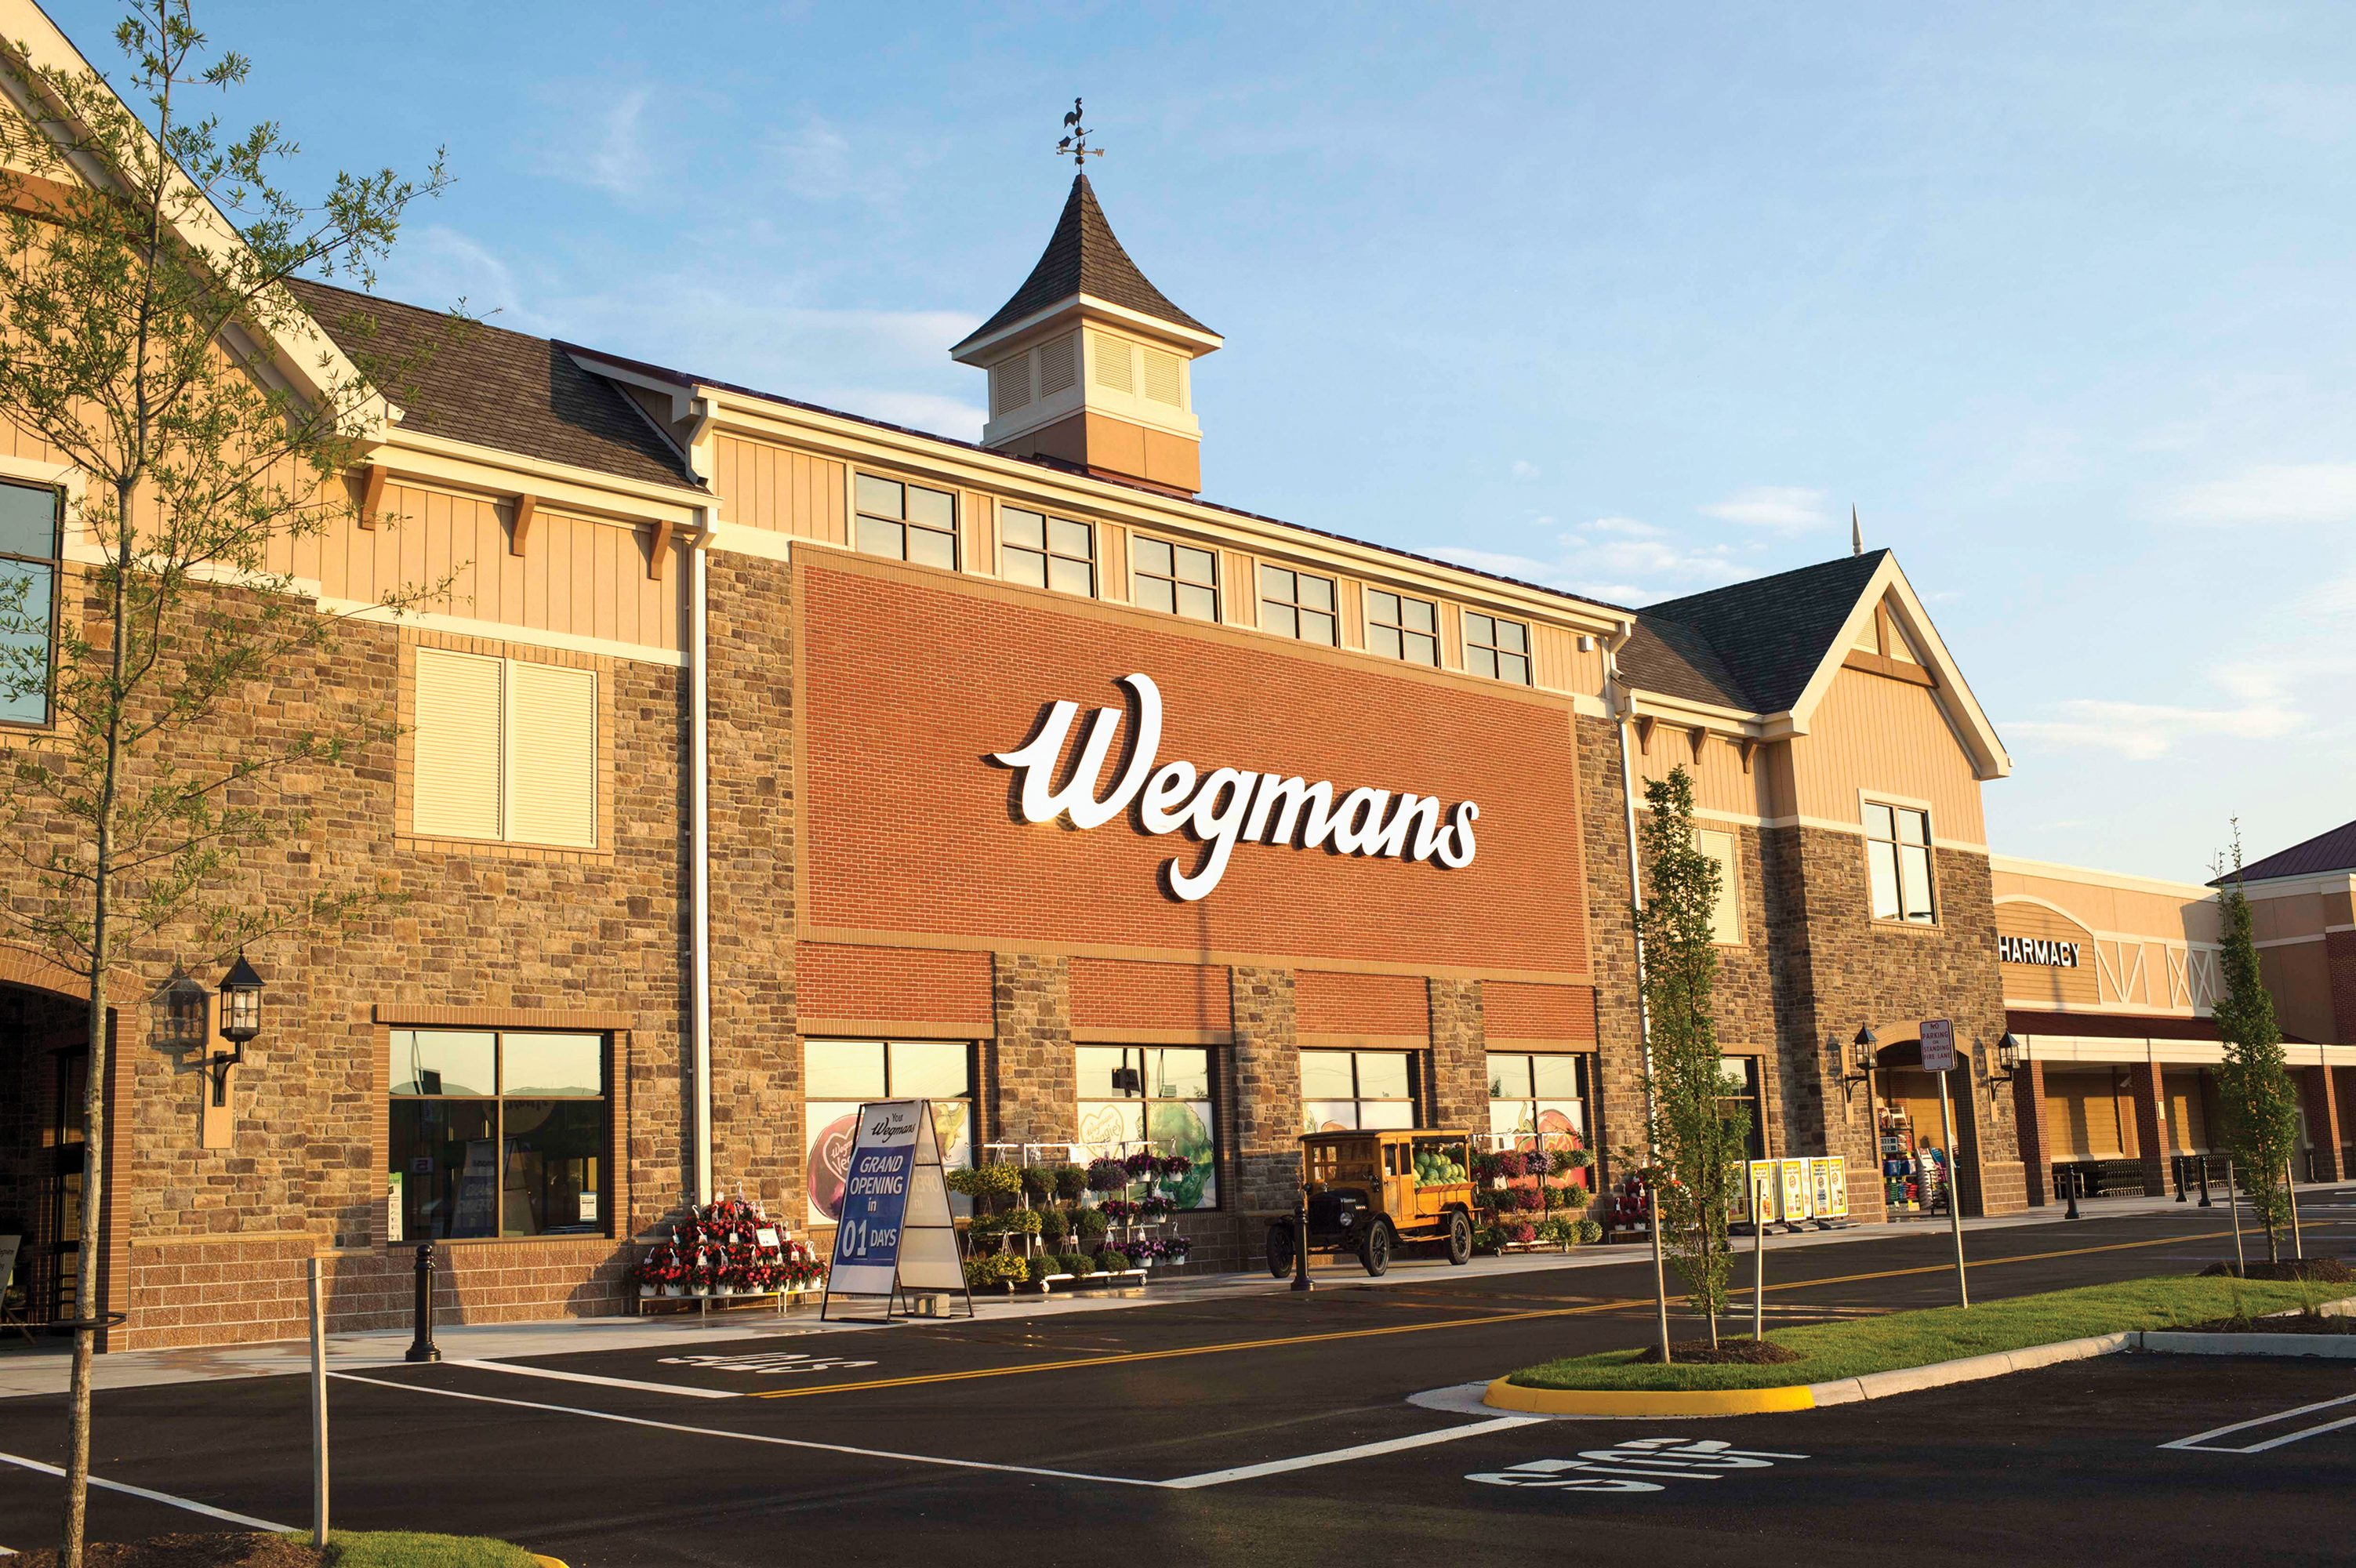 Wegmans supermarket store front